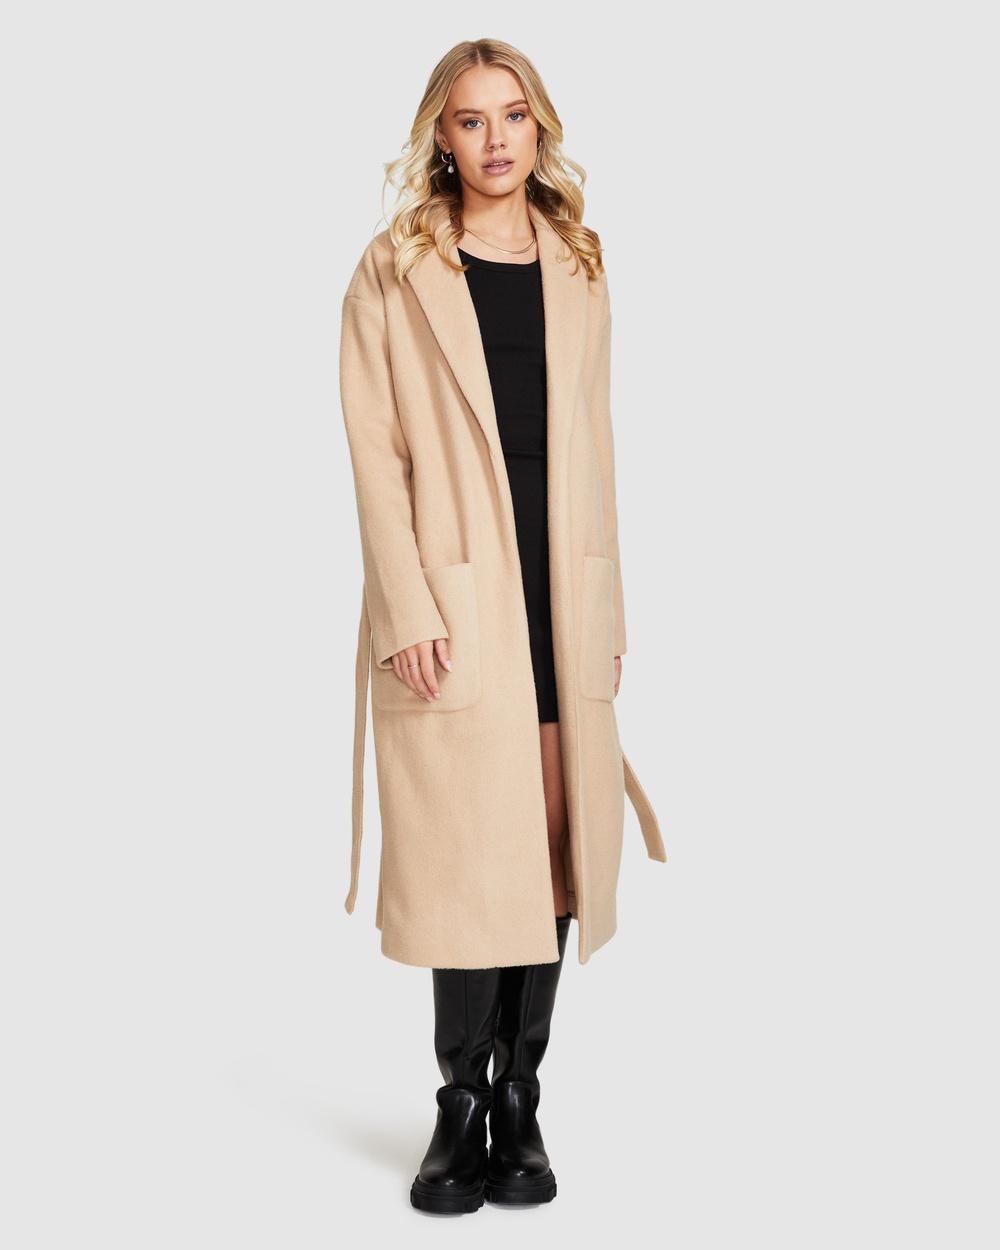 Alice In The Eve Willow Longline Coat Tan Coats & Jackets TAN